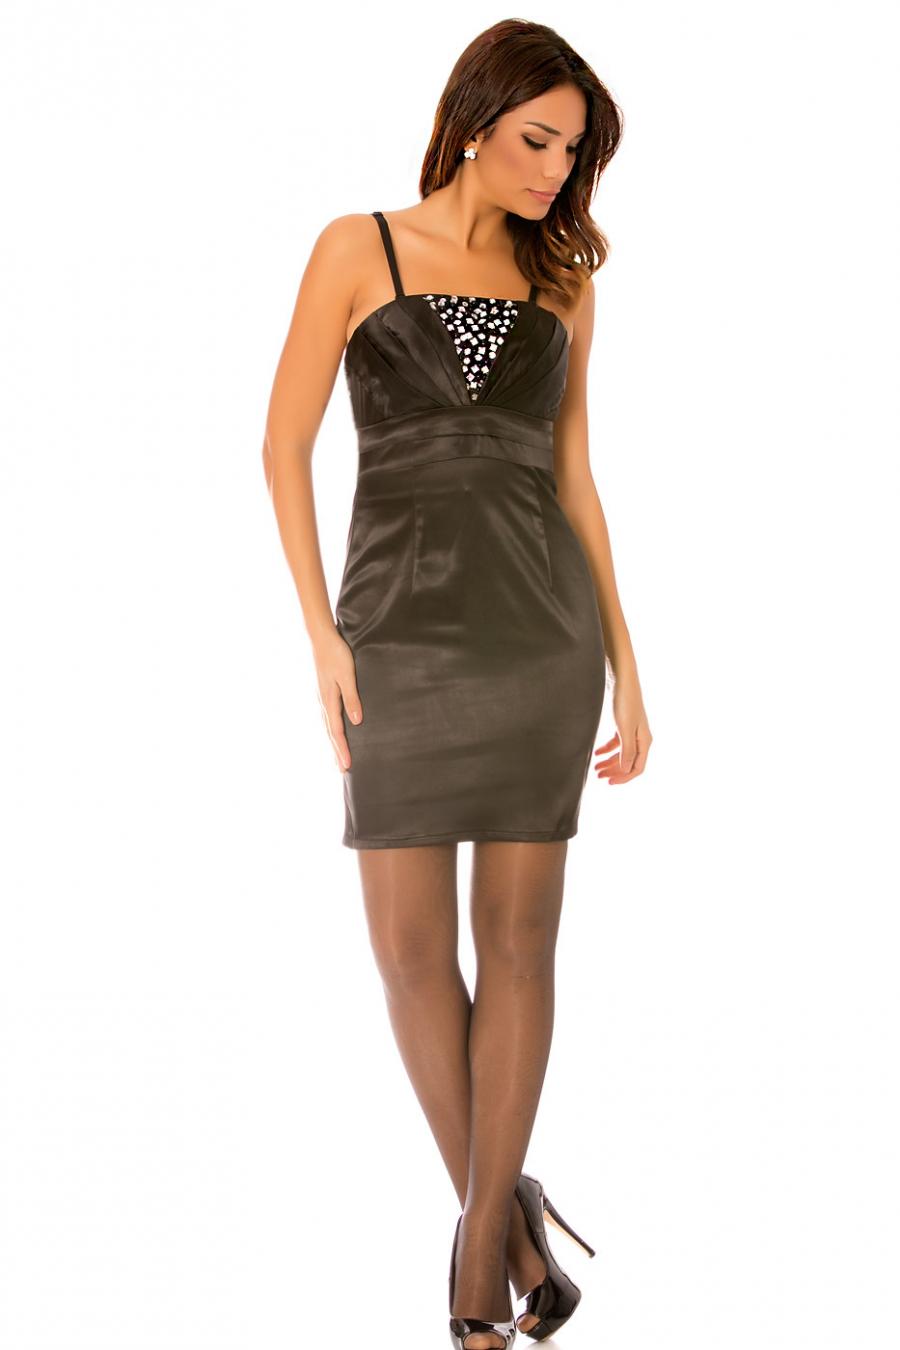 Zwarte avondjurk met mooie strass steentjes en plooi op de borst. Elegante en modieuze jurk. 070